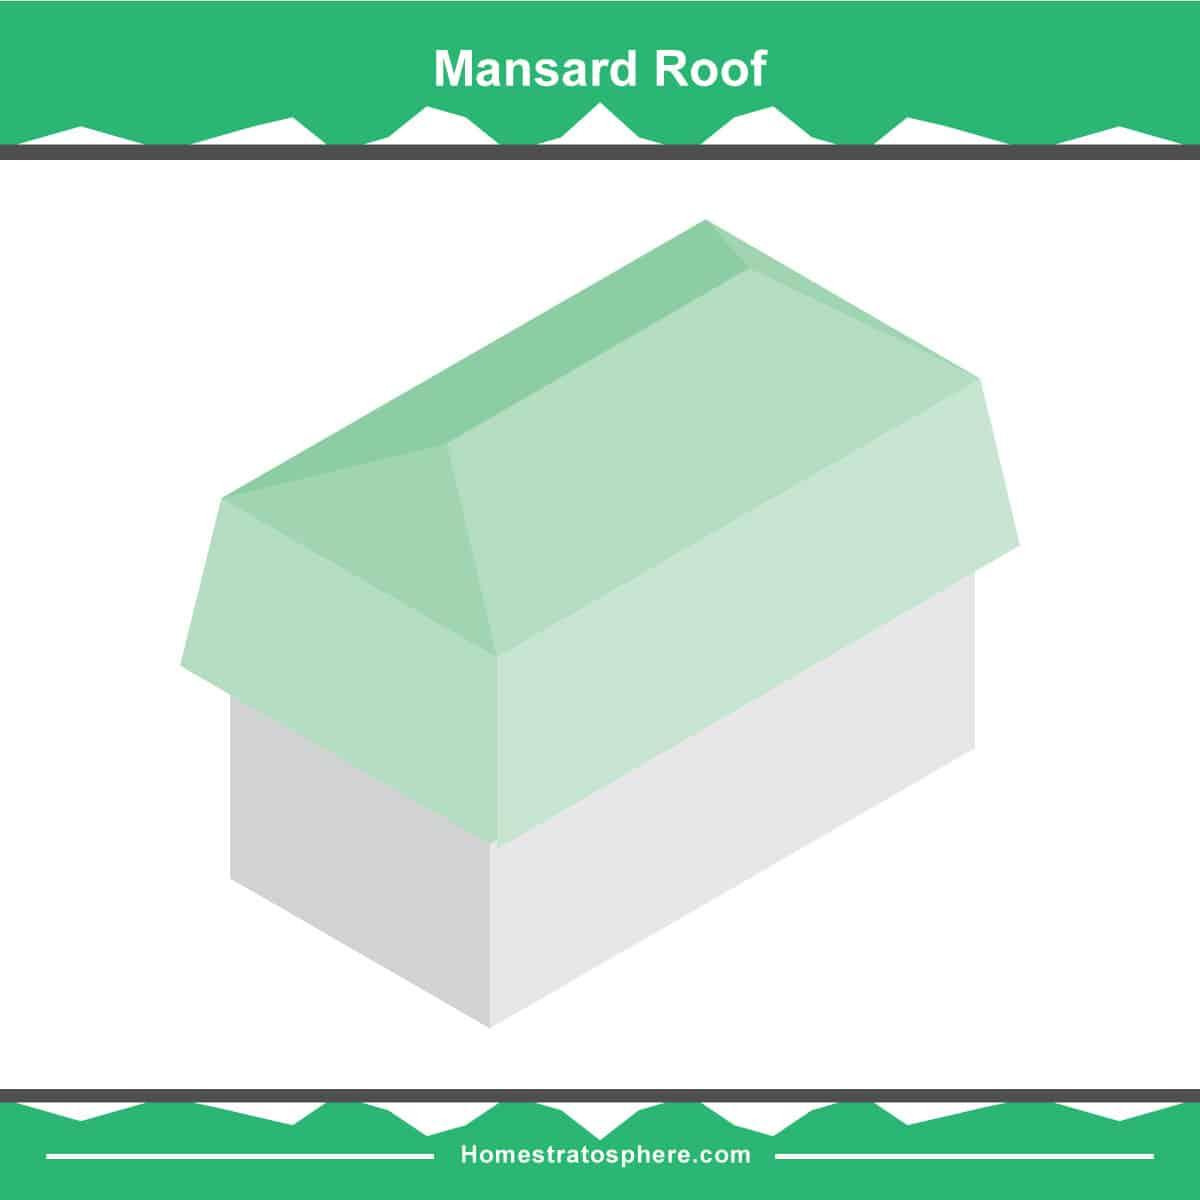 Mansard roof diagram